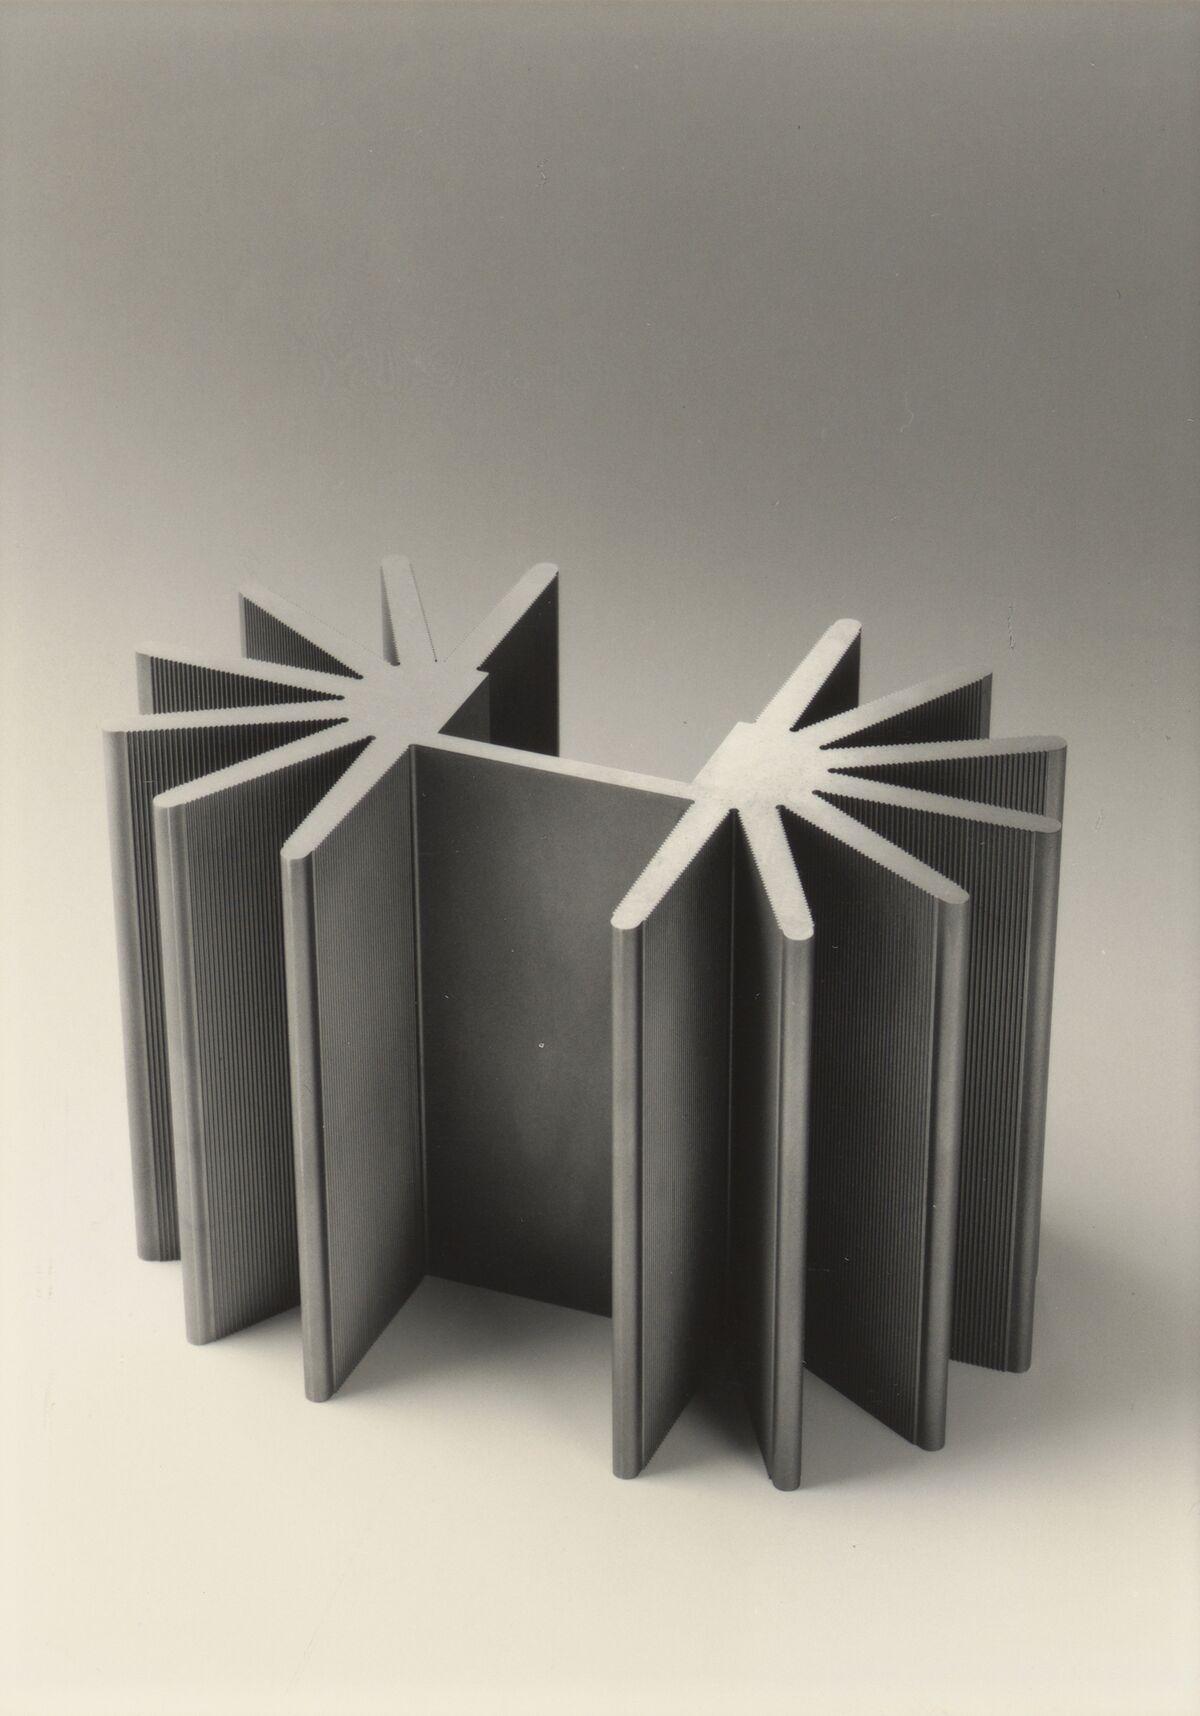 GFA 42/100425: Kühlkörper für Elektronik-Bauteile